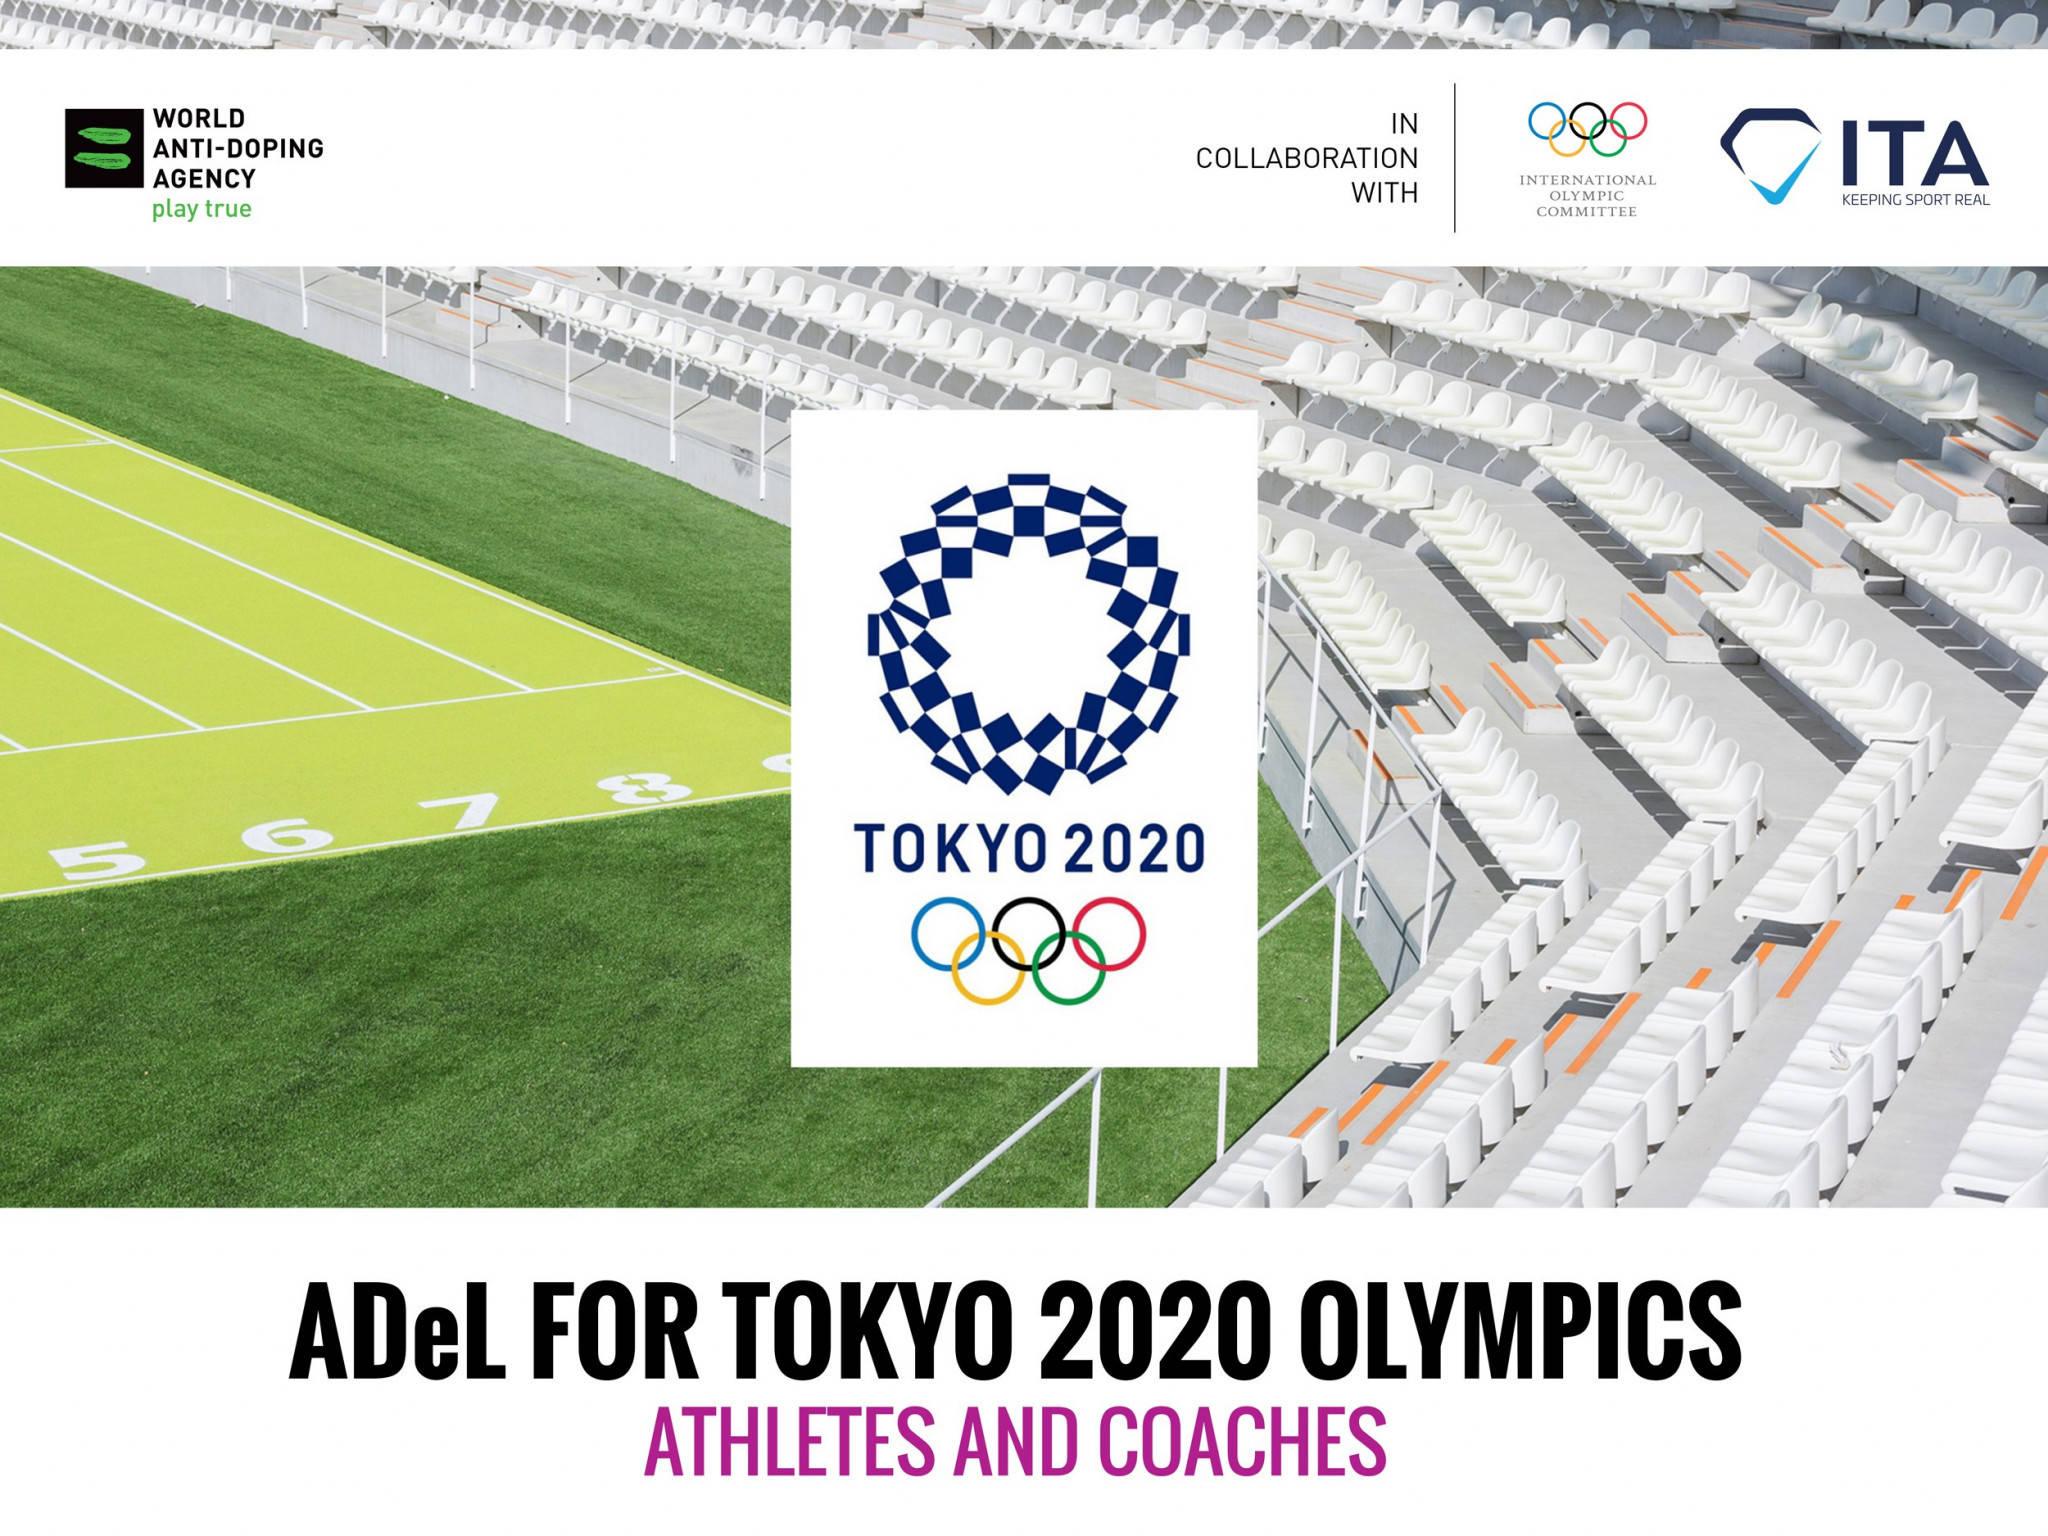 WADA开设新版互动教育课程 为纯净东京奥运努力